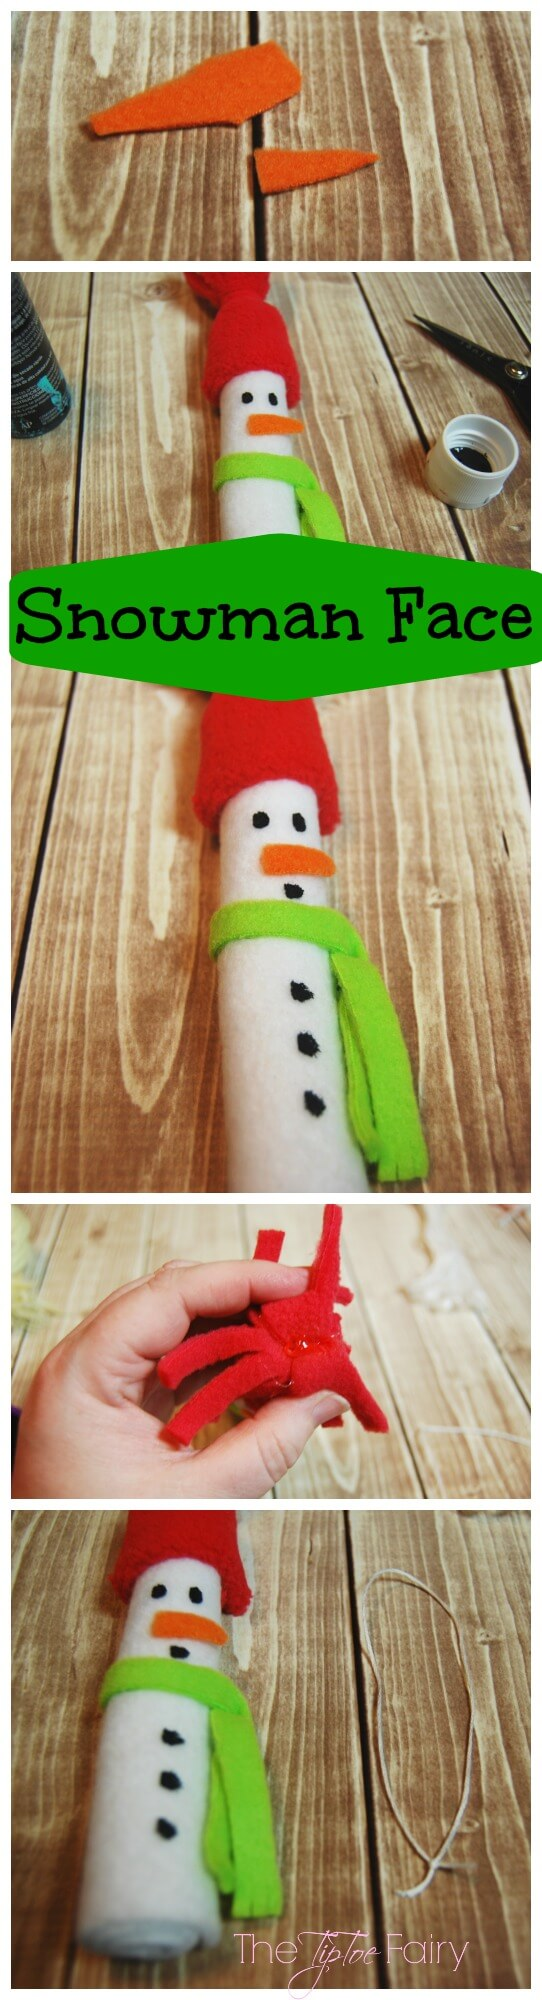 So Sew Easy Christmas in July Felt Ornaments - Easy Felt Snowman | The TipToe Fairy #christmasinjuly #christmasornaments #ornamenttutorials #tutorial